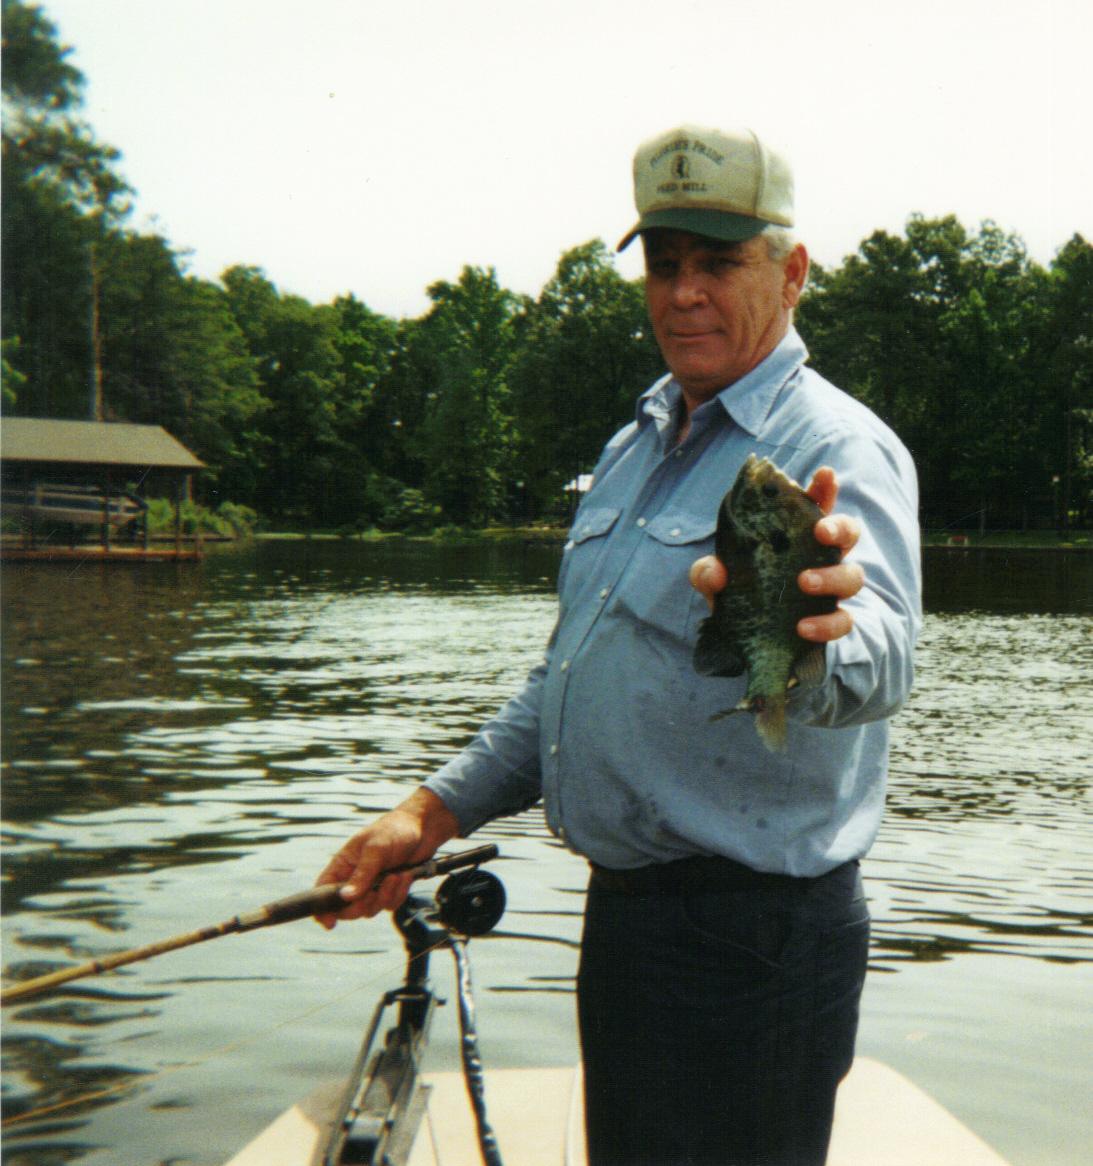 Marvin Hallonquist